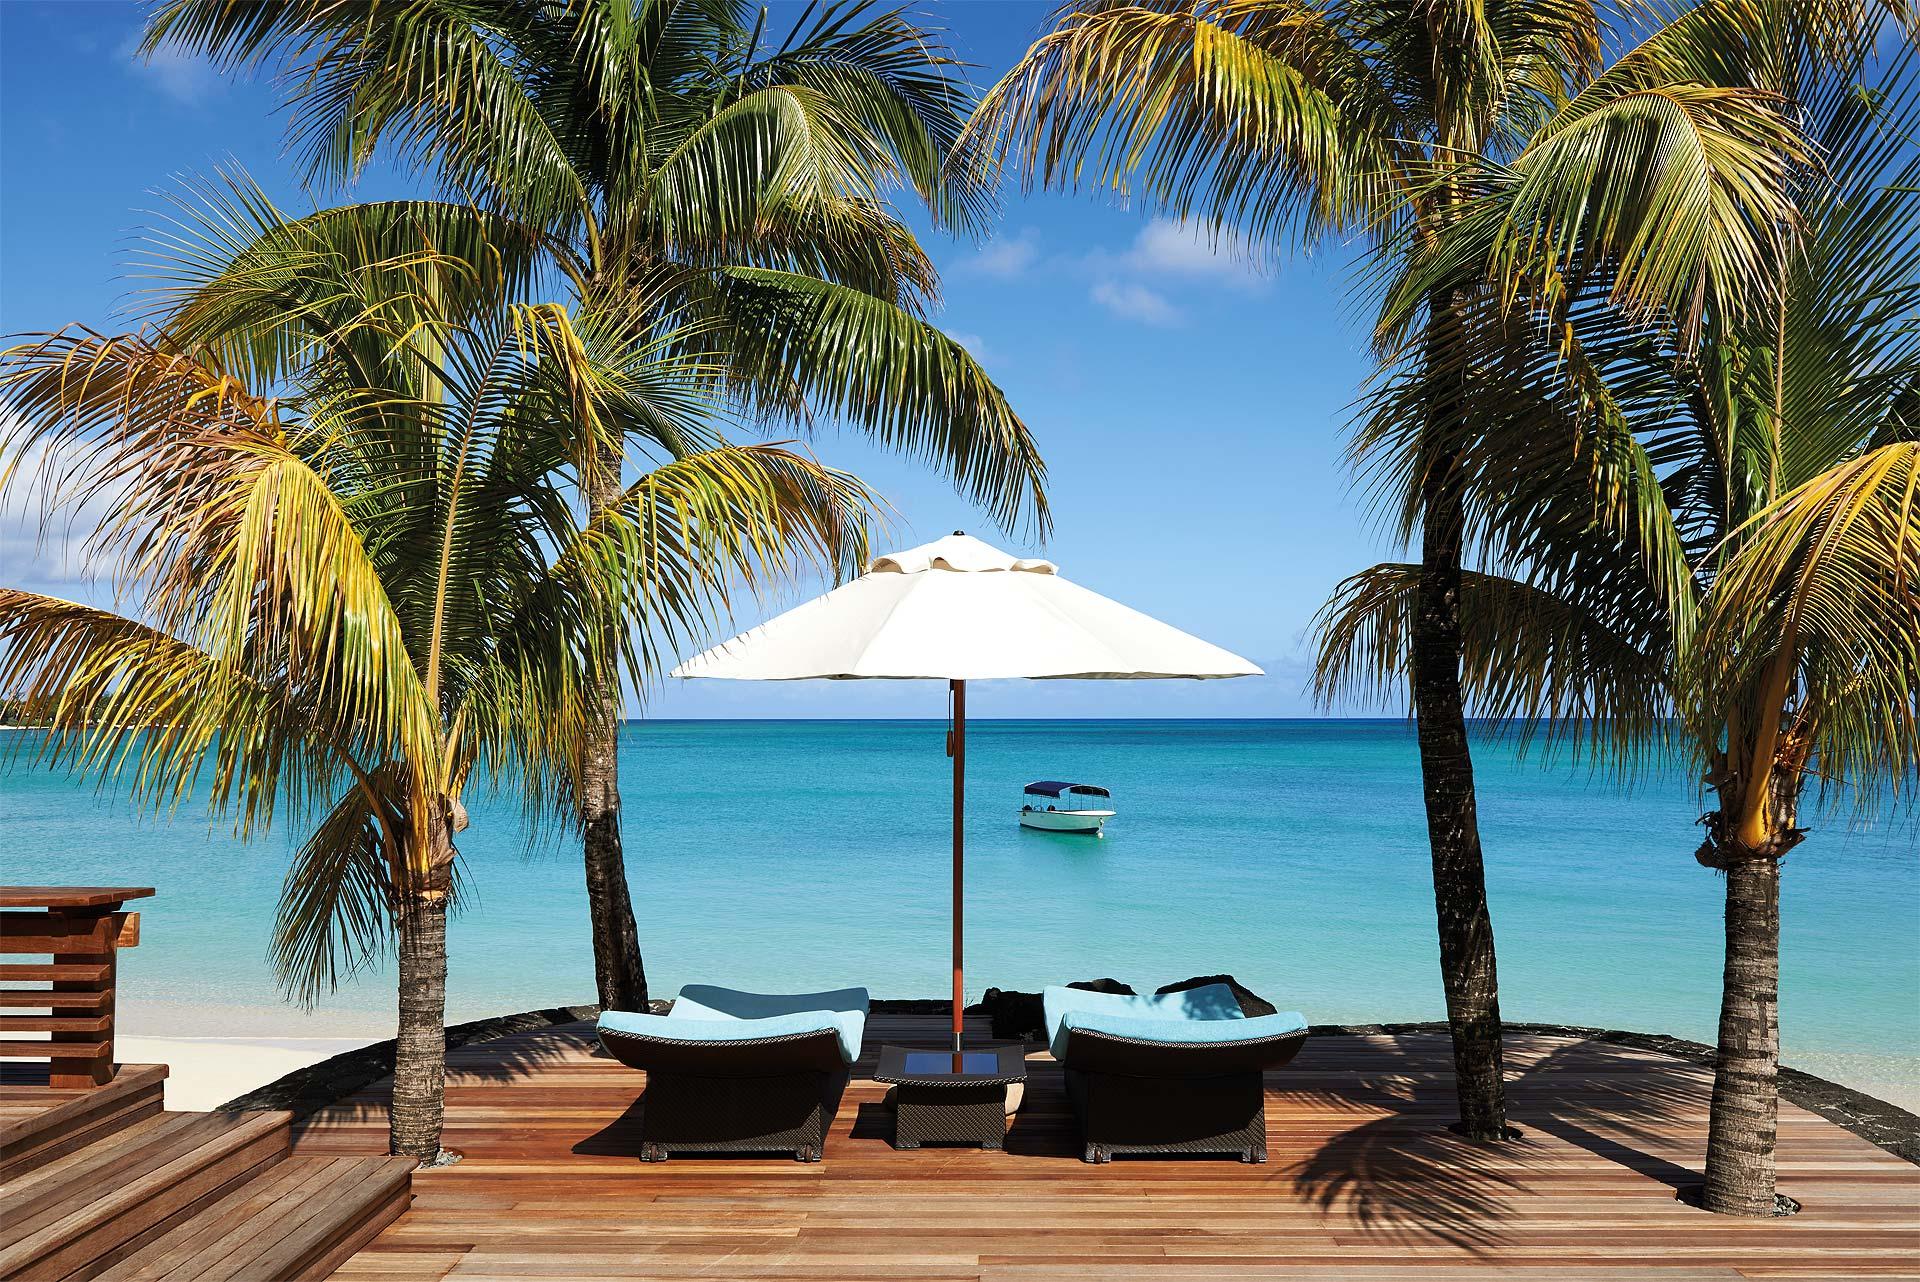 Something Blue - Royal Palm Beachcomber Hotel